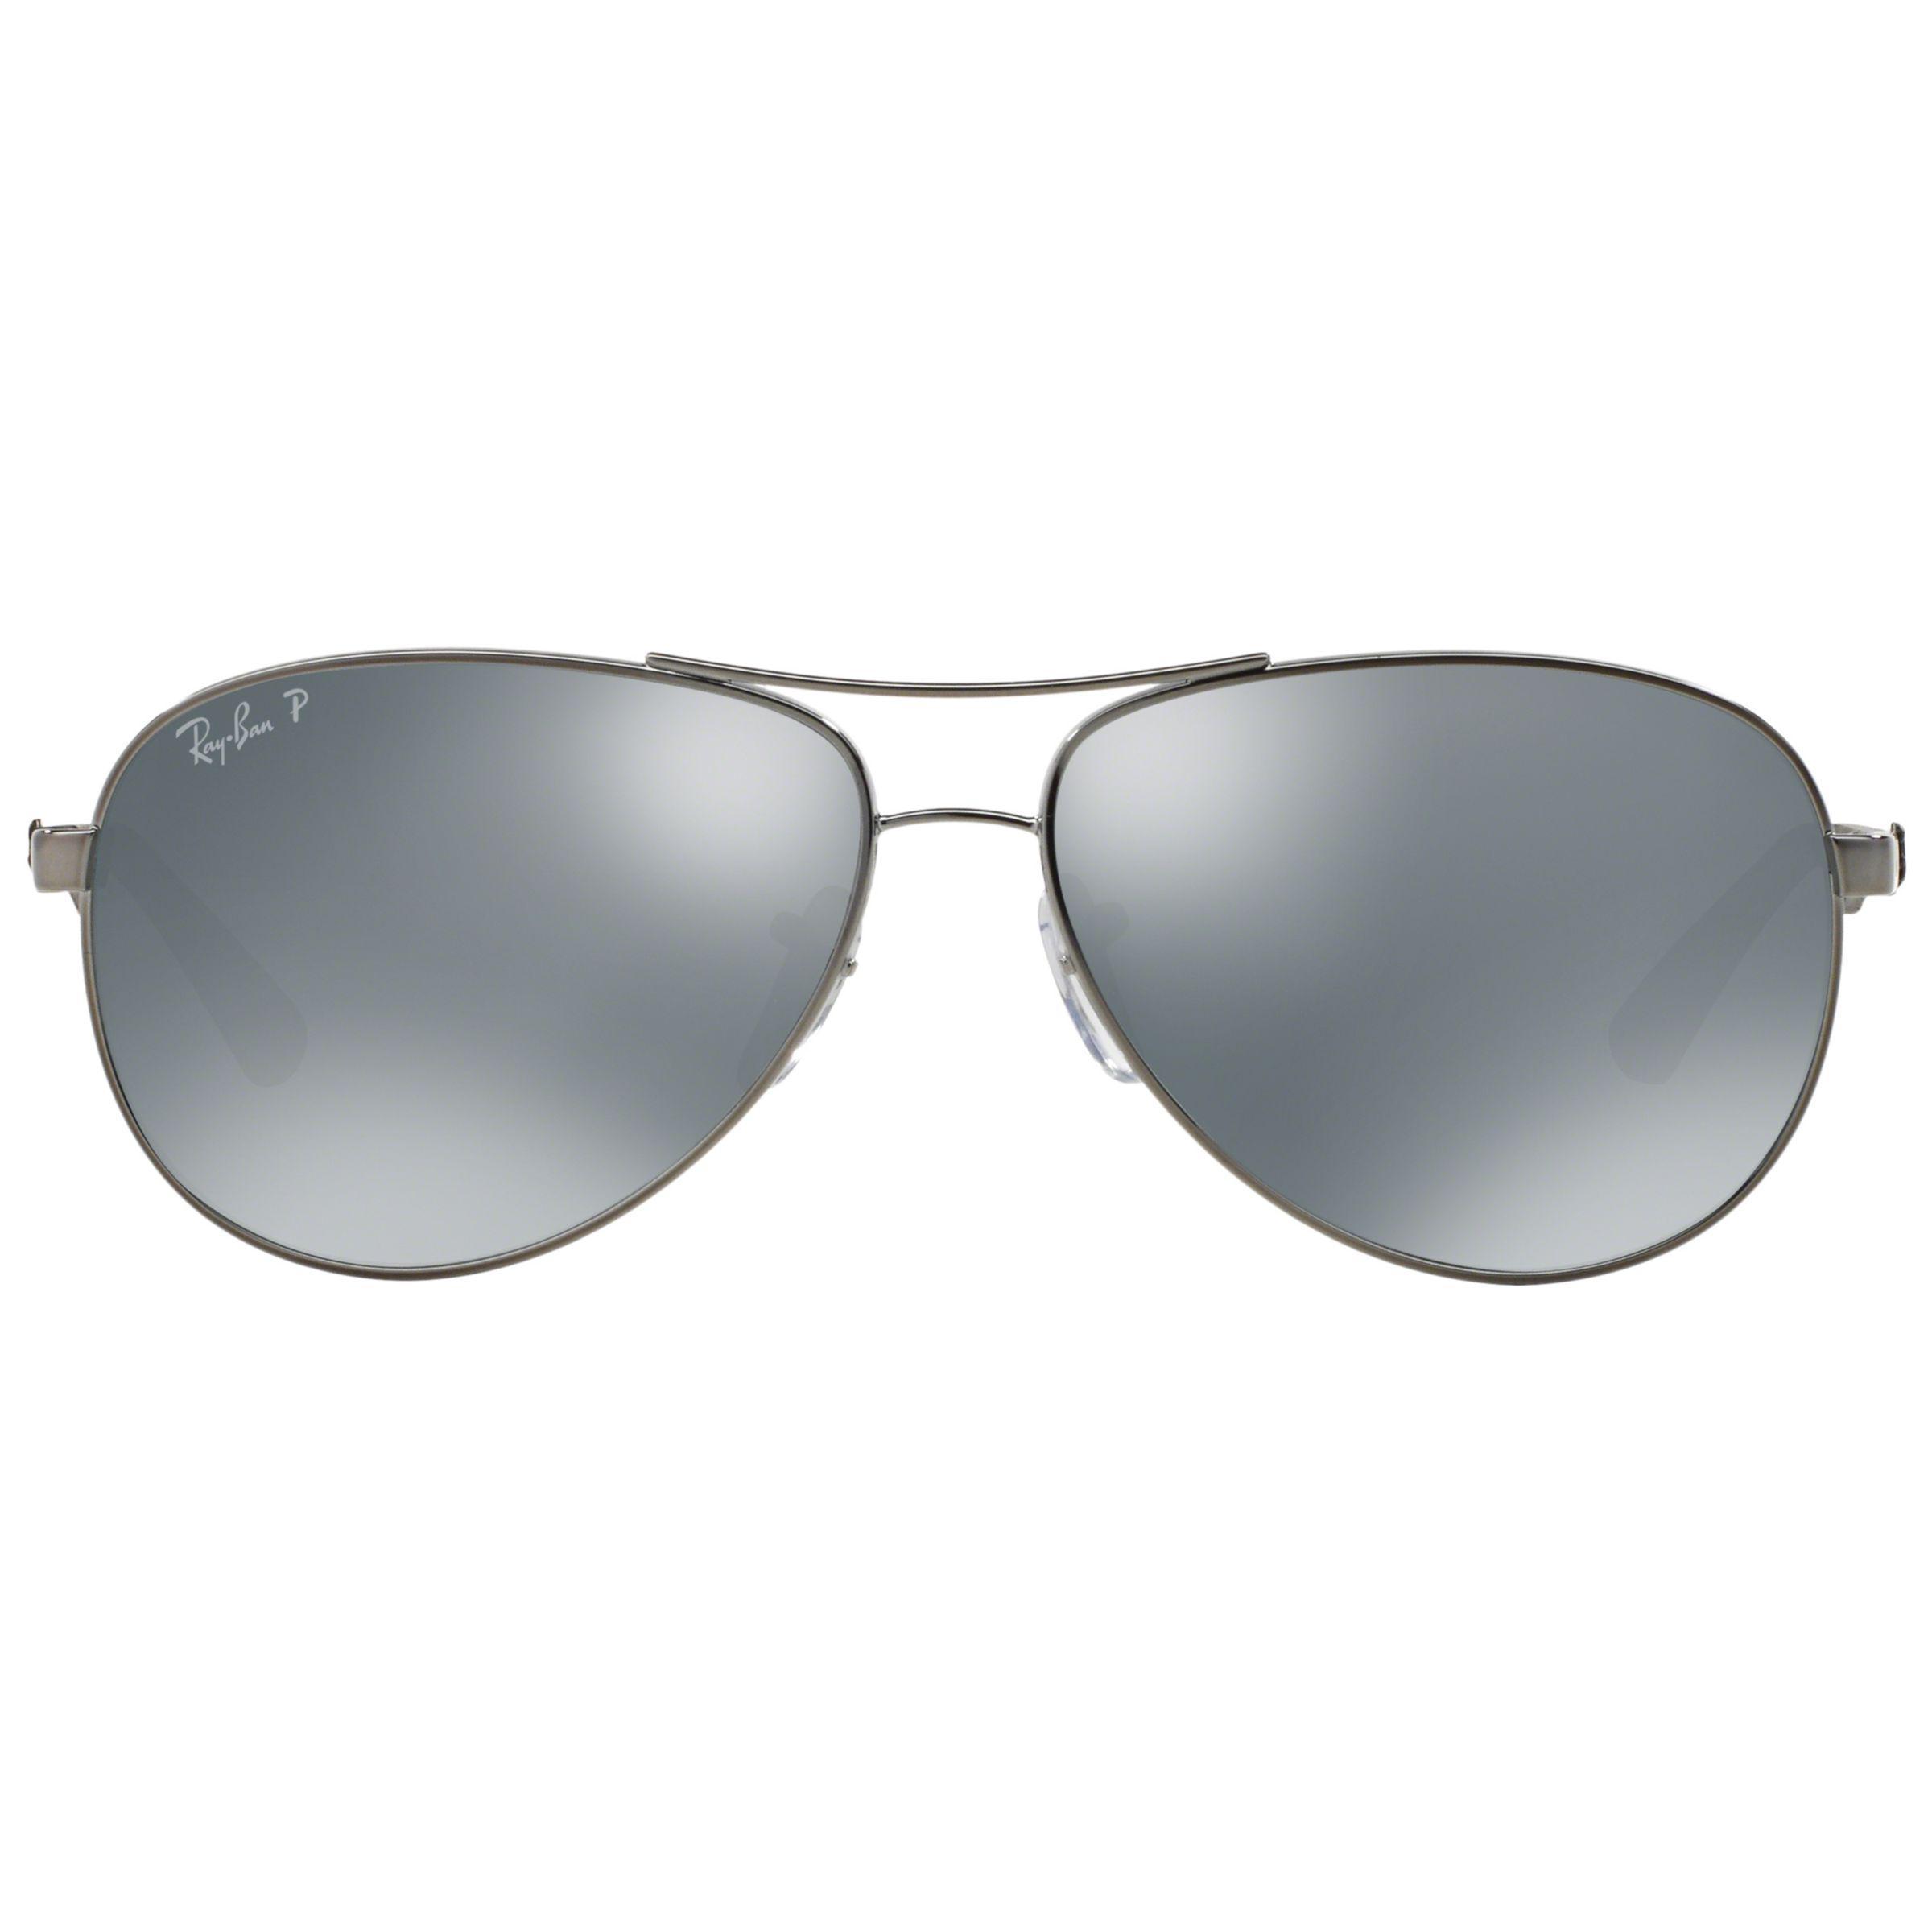 54dd81df59 Ray-Ban - Metallic Rb8313 Polarised Pilot Sunglasses for Men - Lyst. View  fullscreen